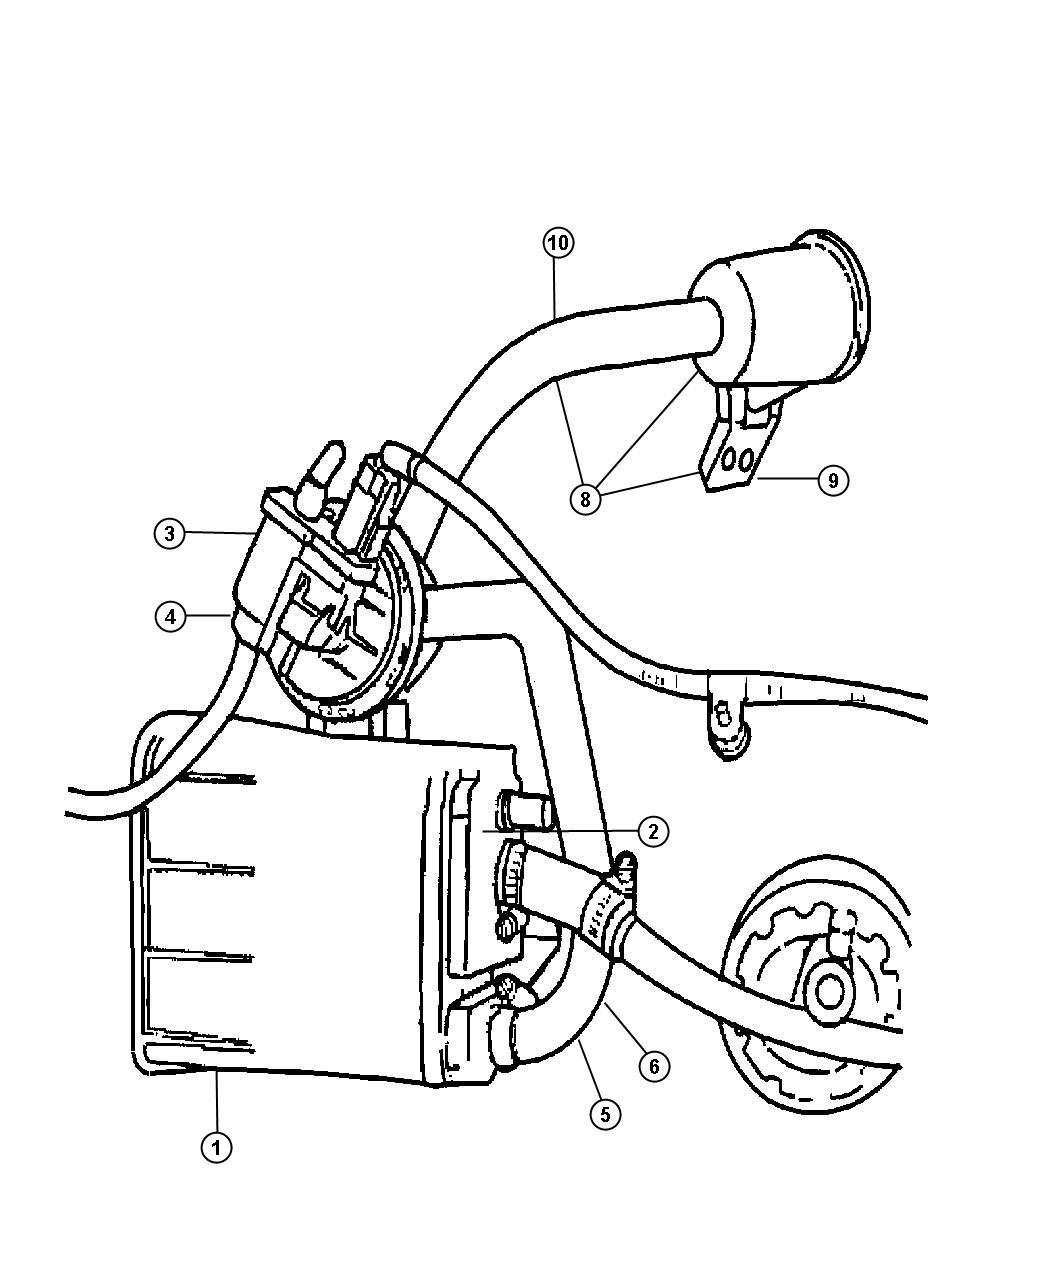 Jeep Grand Cherokee Pump Leak Detection Emissions